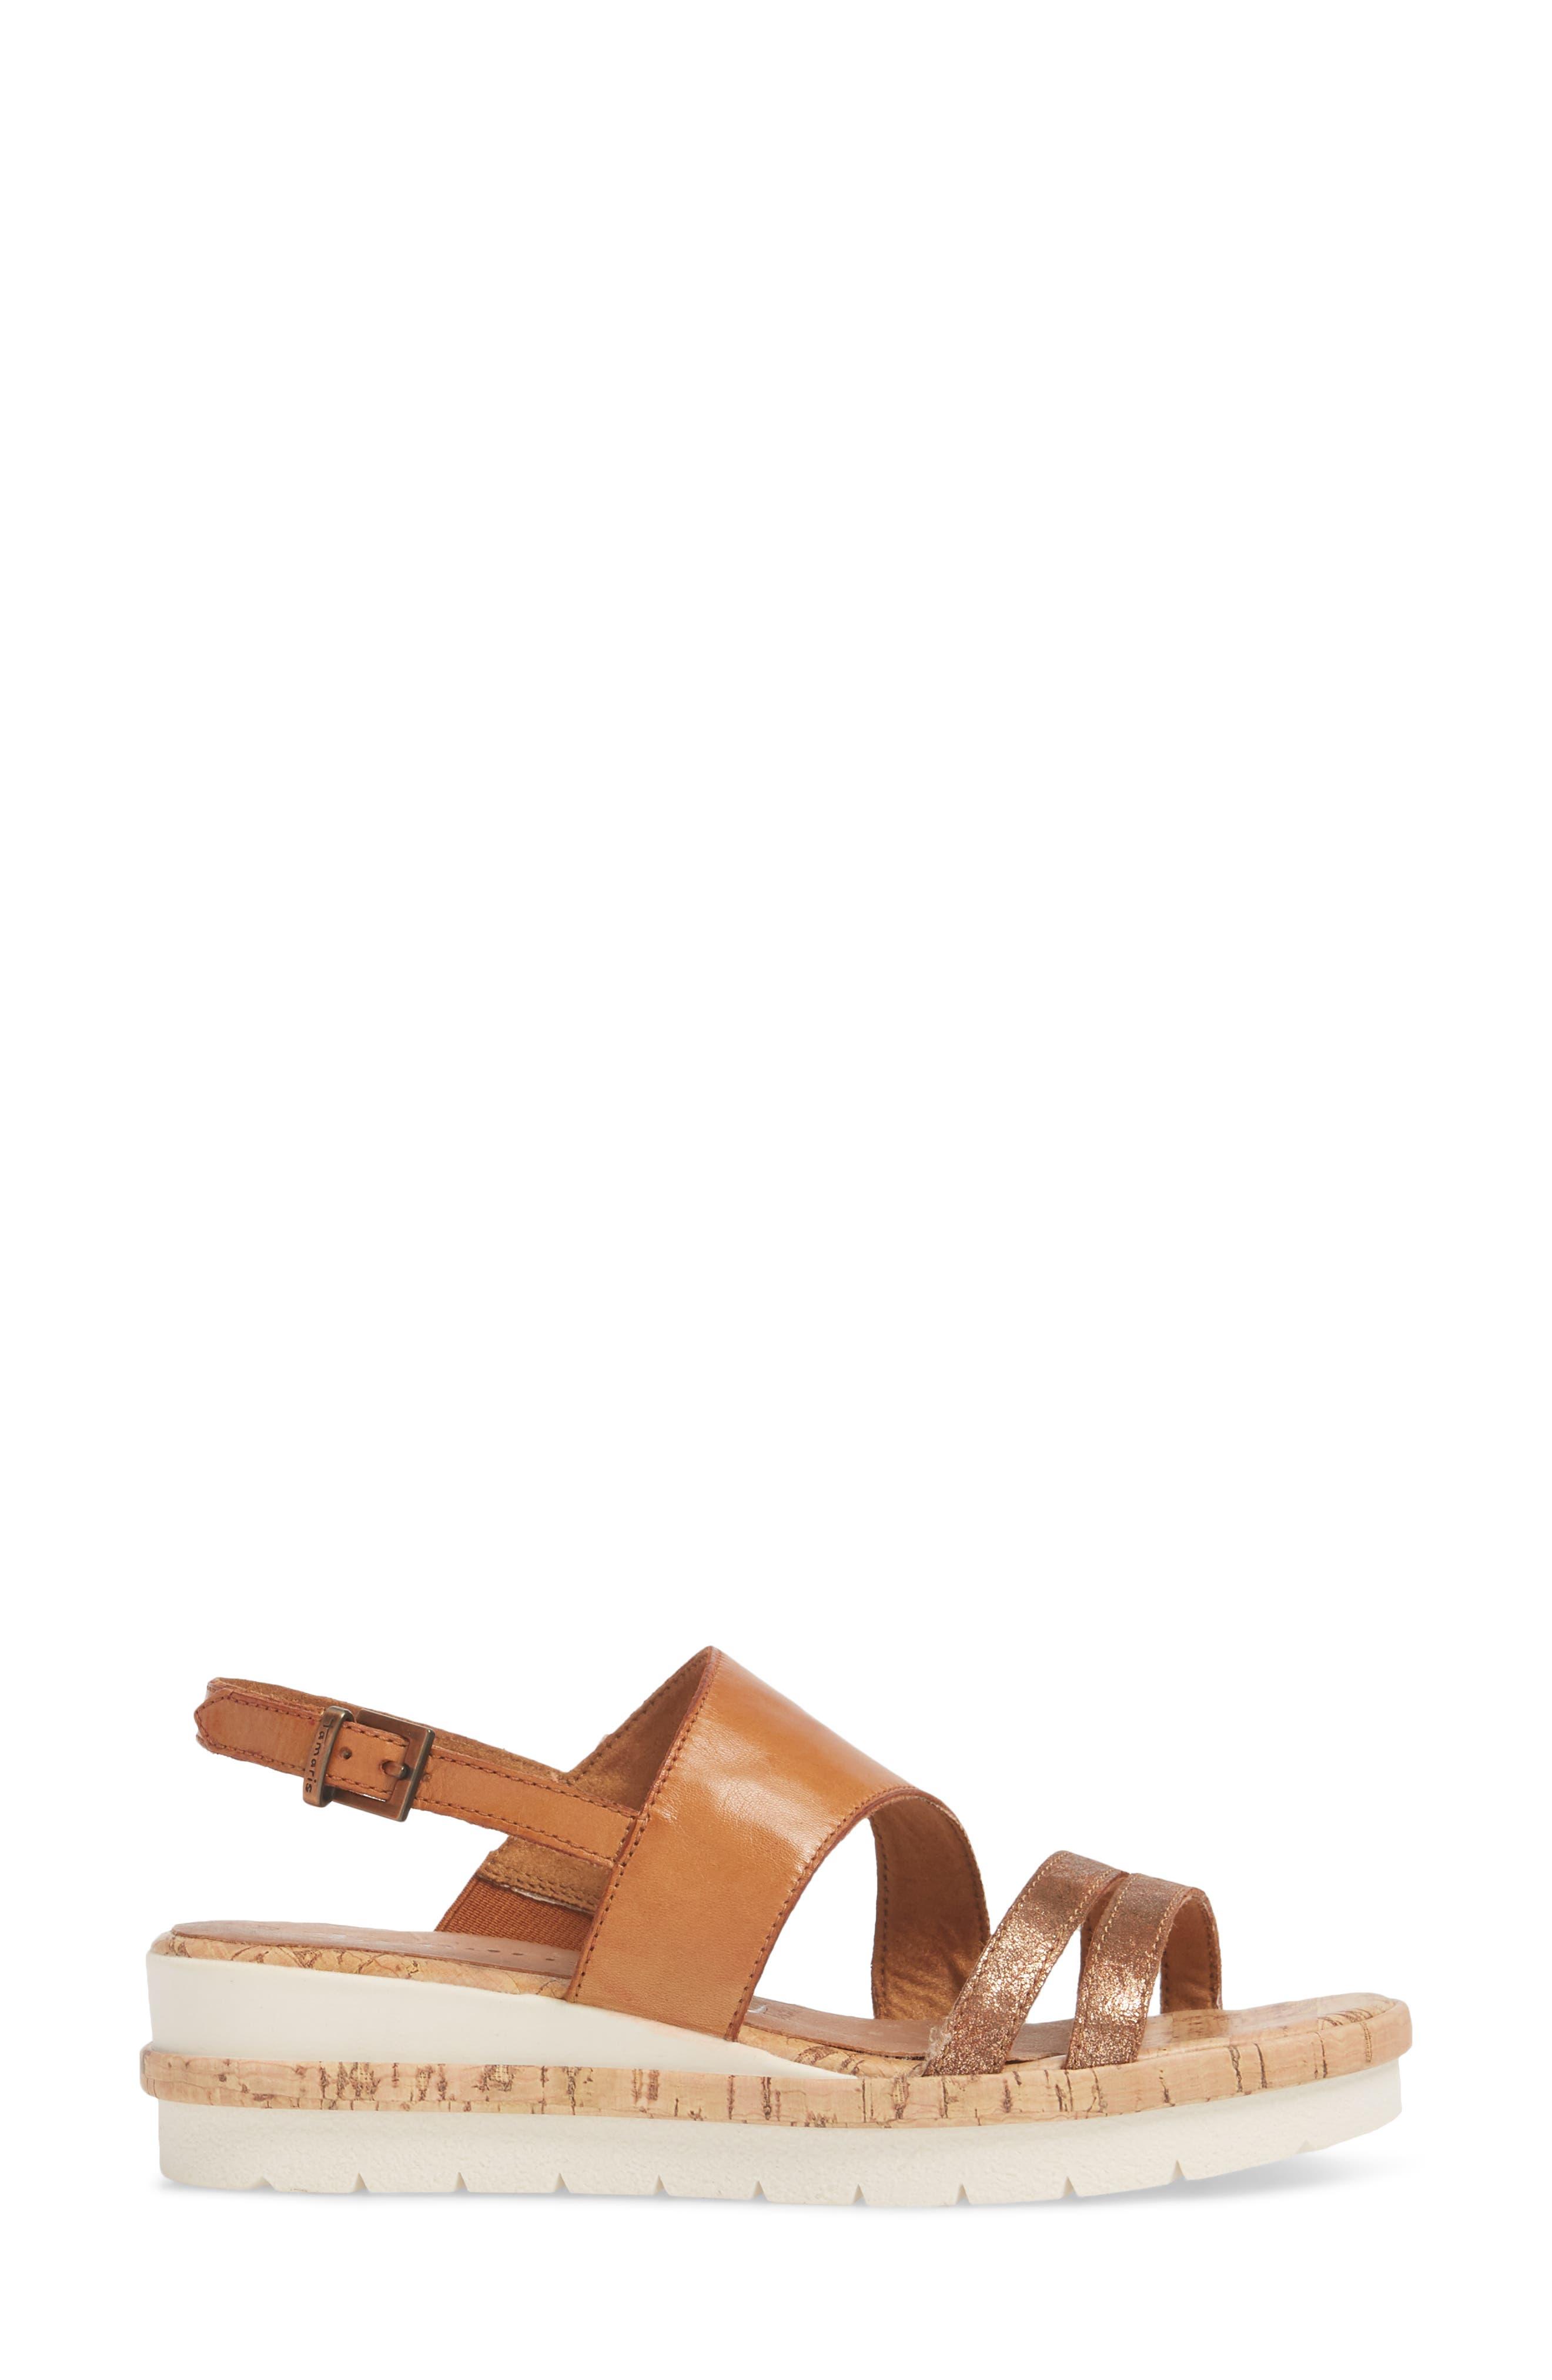 Eda Wedge Sandal,                             Alternate thumbnail 3, color,                             Nut Leather